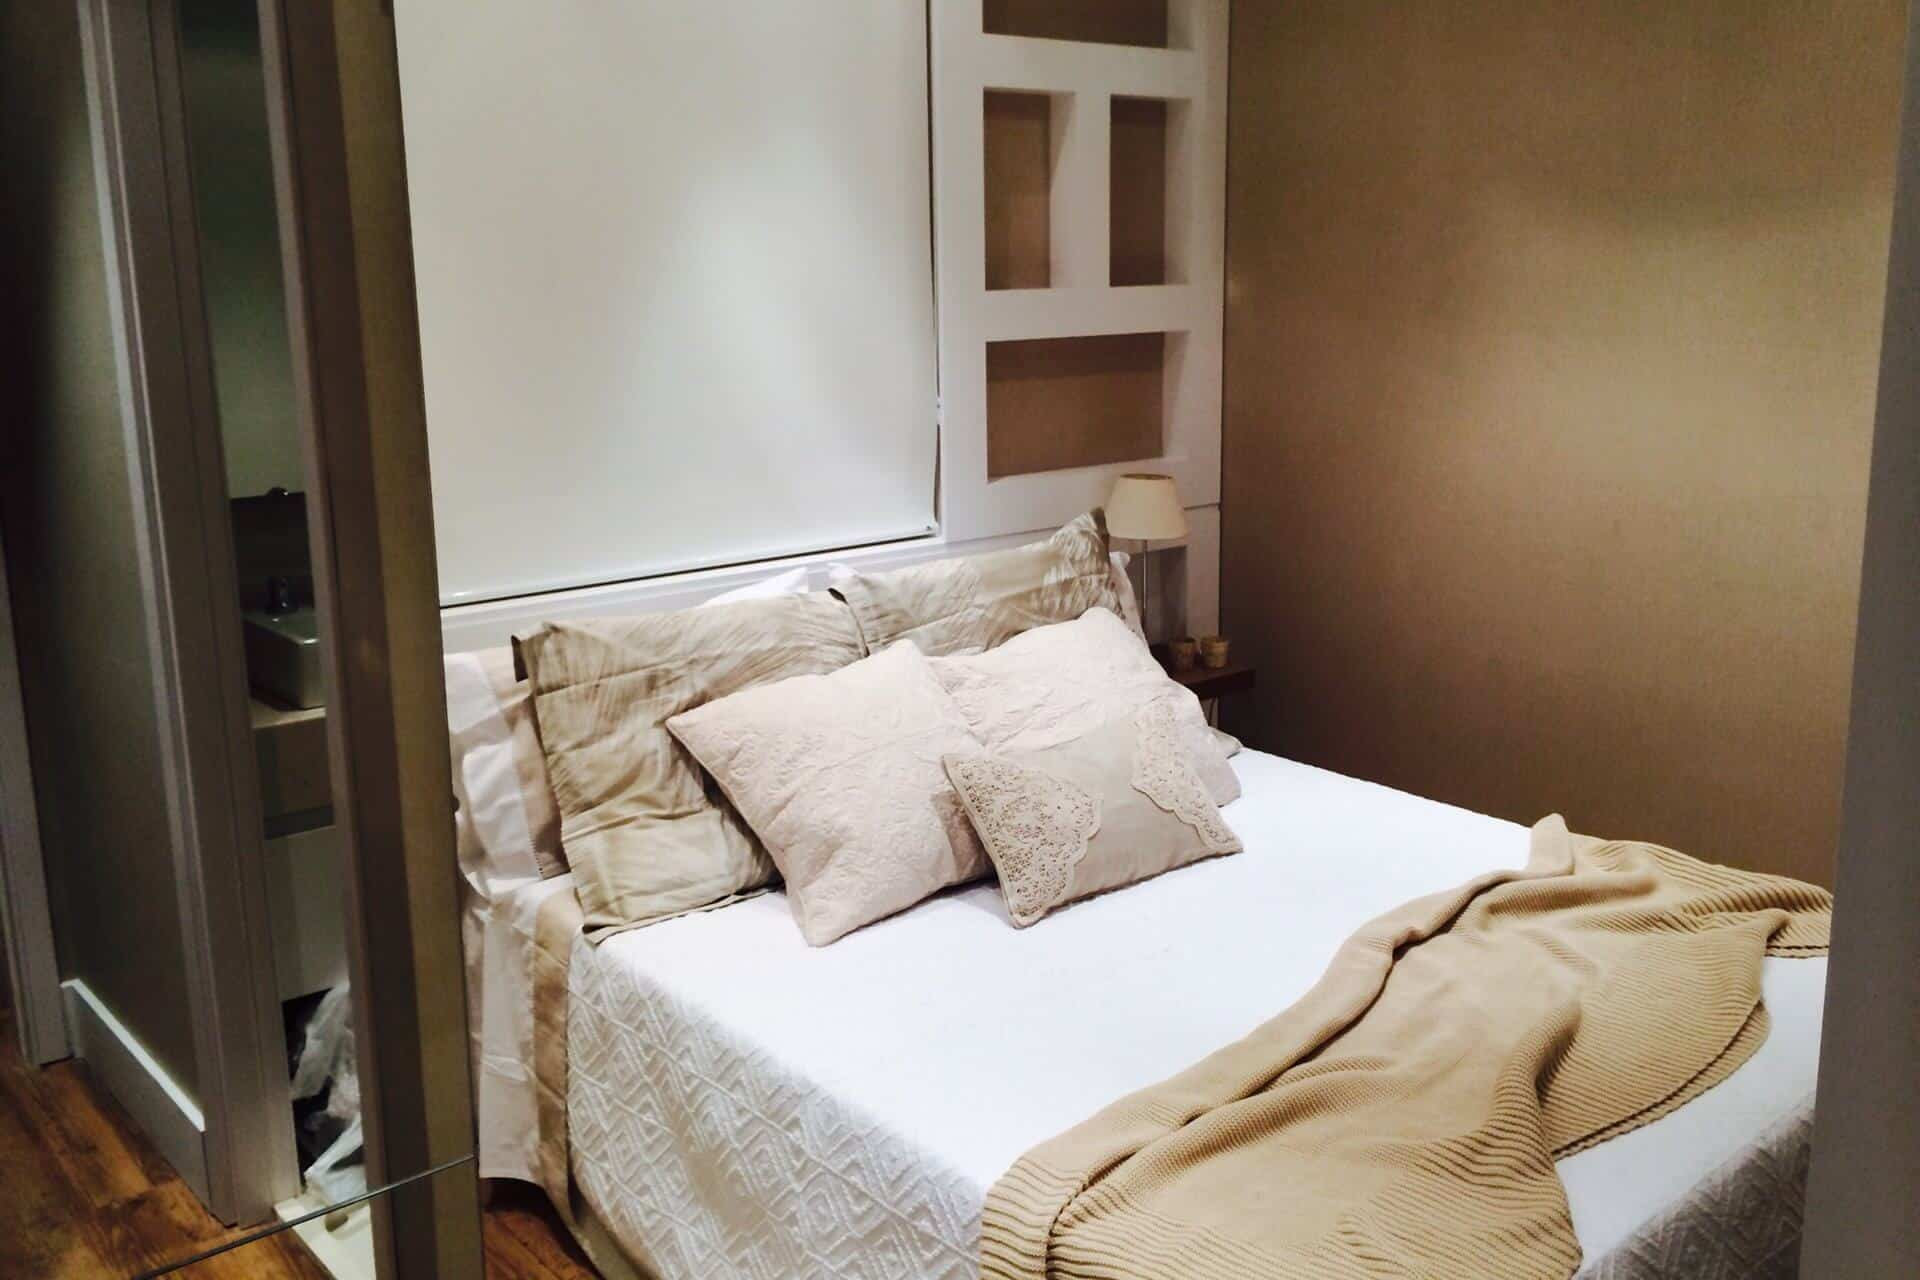 dormitorio-planejado_moveis-sob-medida-galeria-5